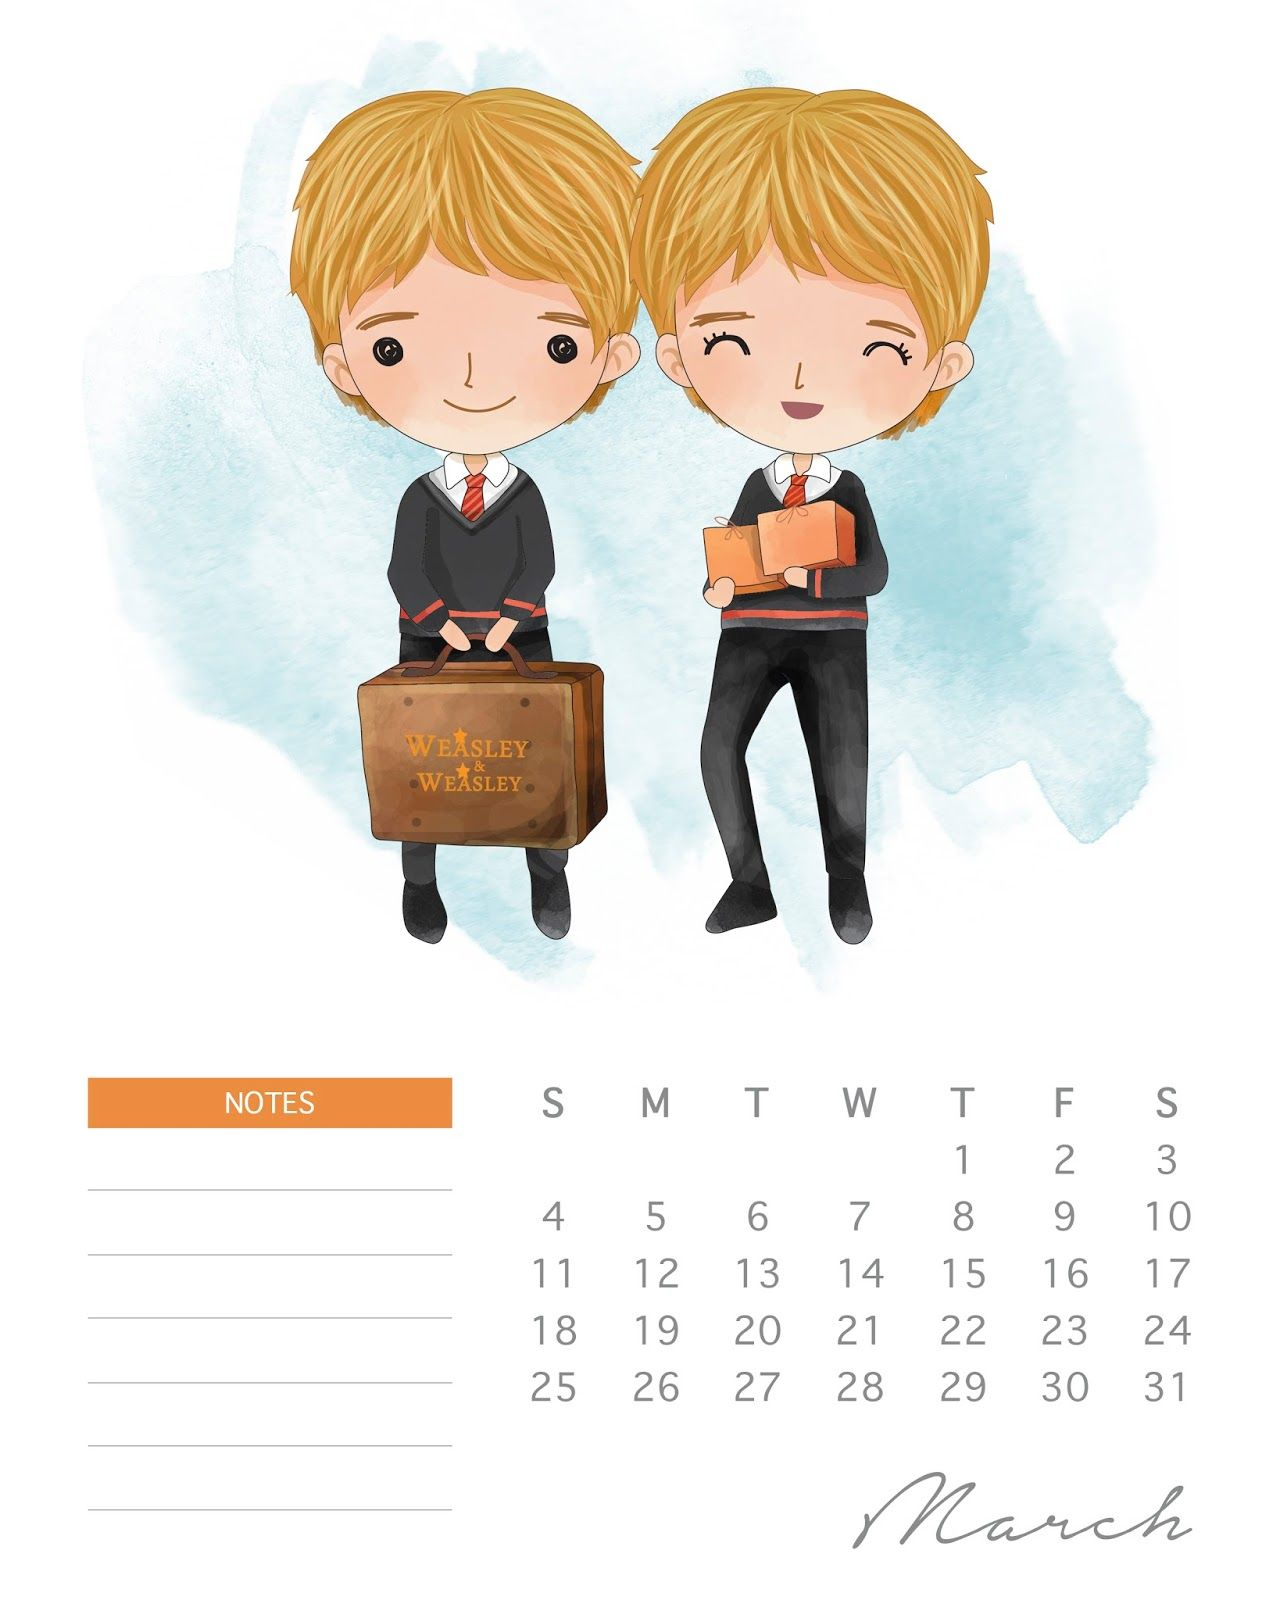 Calendario Harry Potter.Calendario 2018 De Harry Potter Para Imprimir Gratis